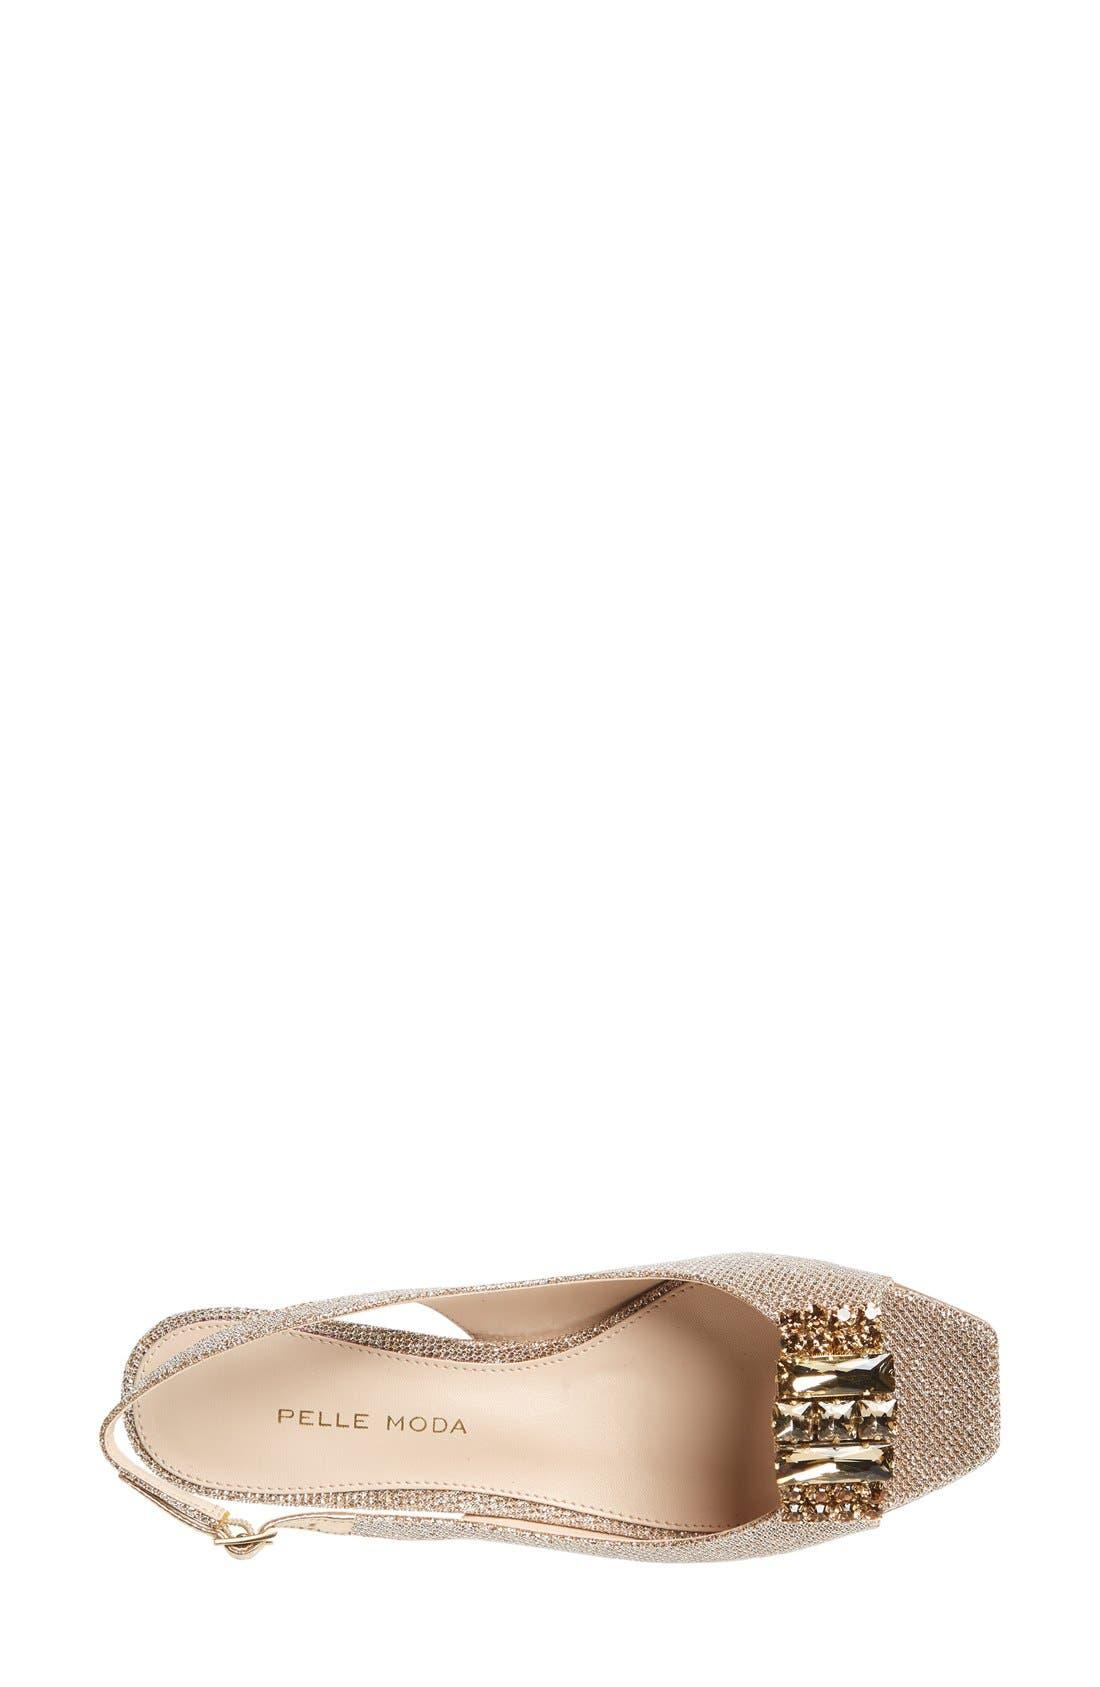 Alternate Image 3  - Pelle Moda 'Fresh' Jeweled Metallic Leather Slingback Sandal (Women)